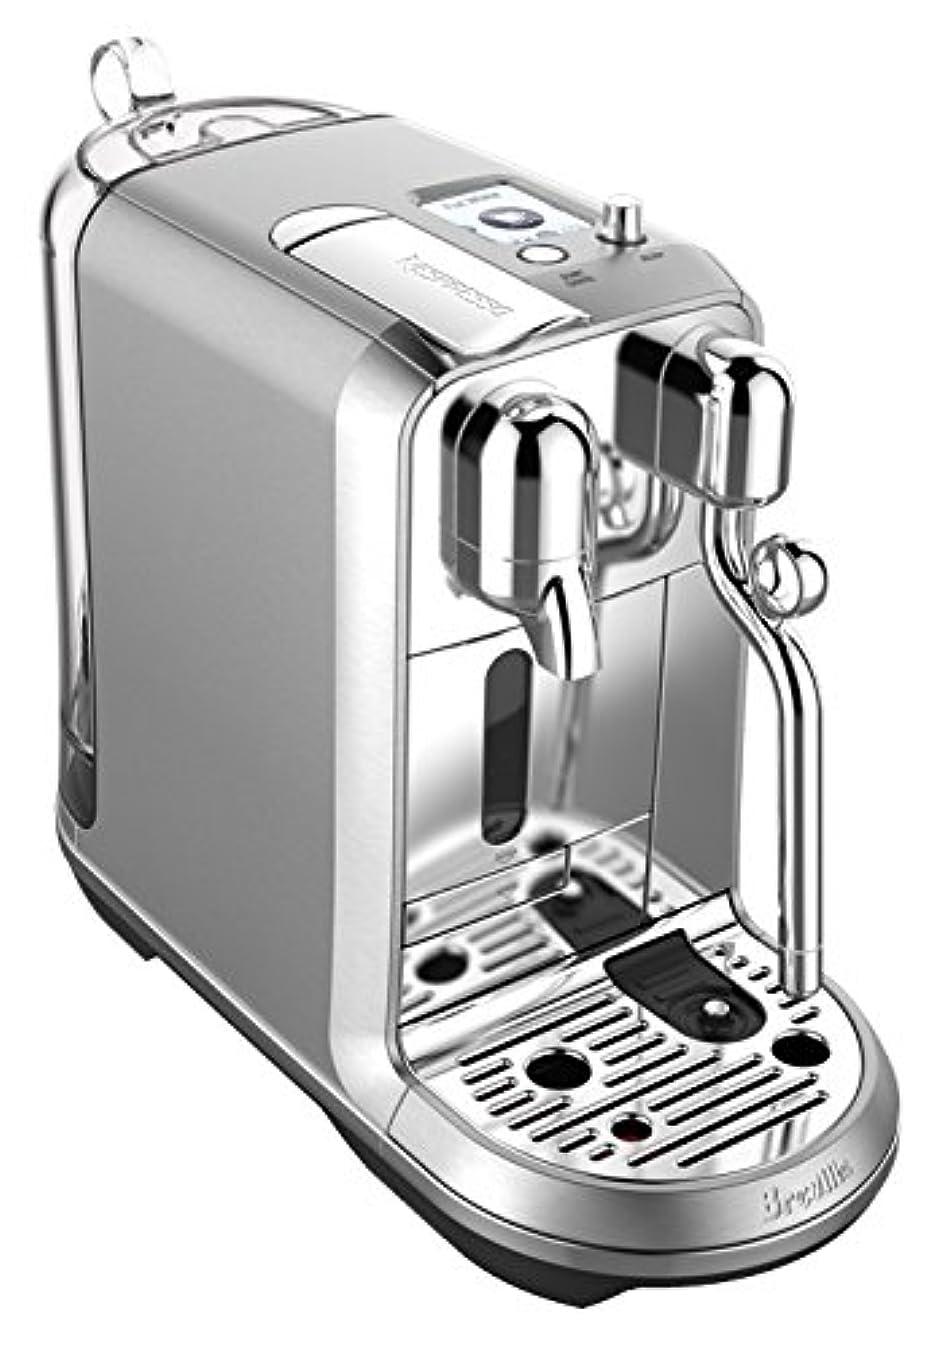 Nespresso Creatista Plus Coffee and Espresso Machine by Breville, Stainless Steel